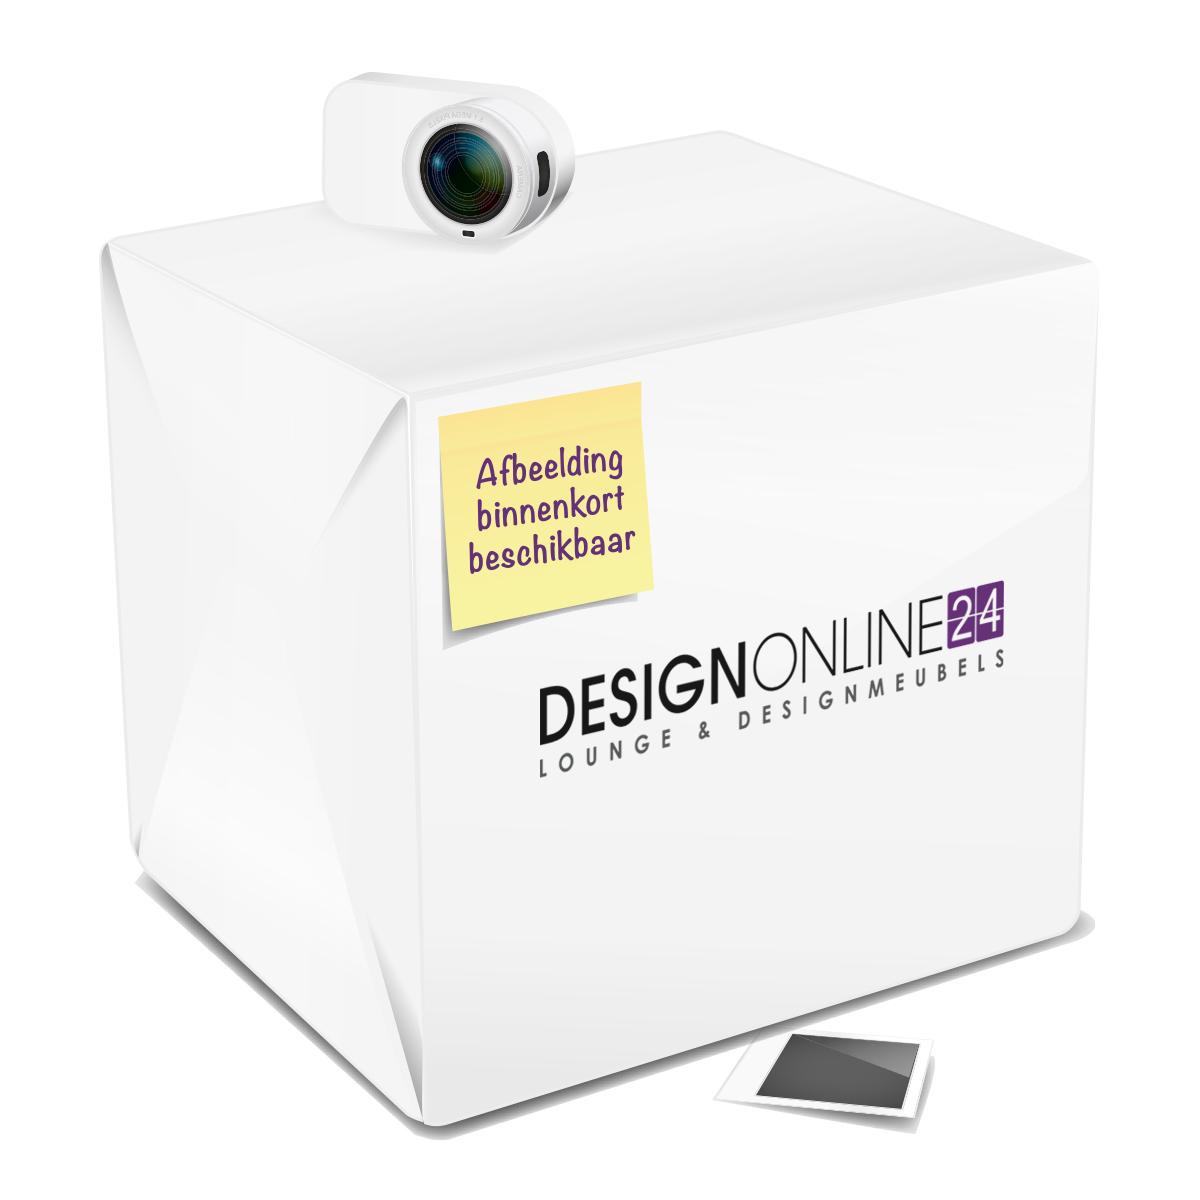 NEXT Design Hanglamp NLC u00d8 55.5 cm LED - Goud - DesignOnline24